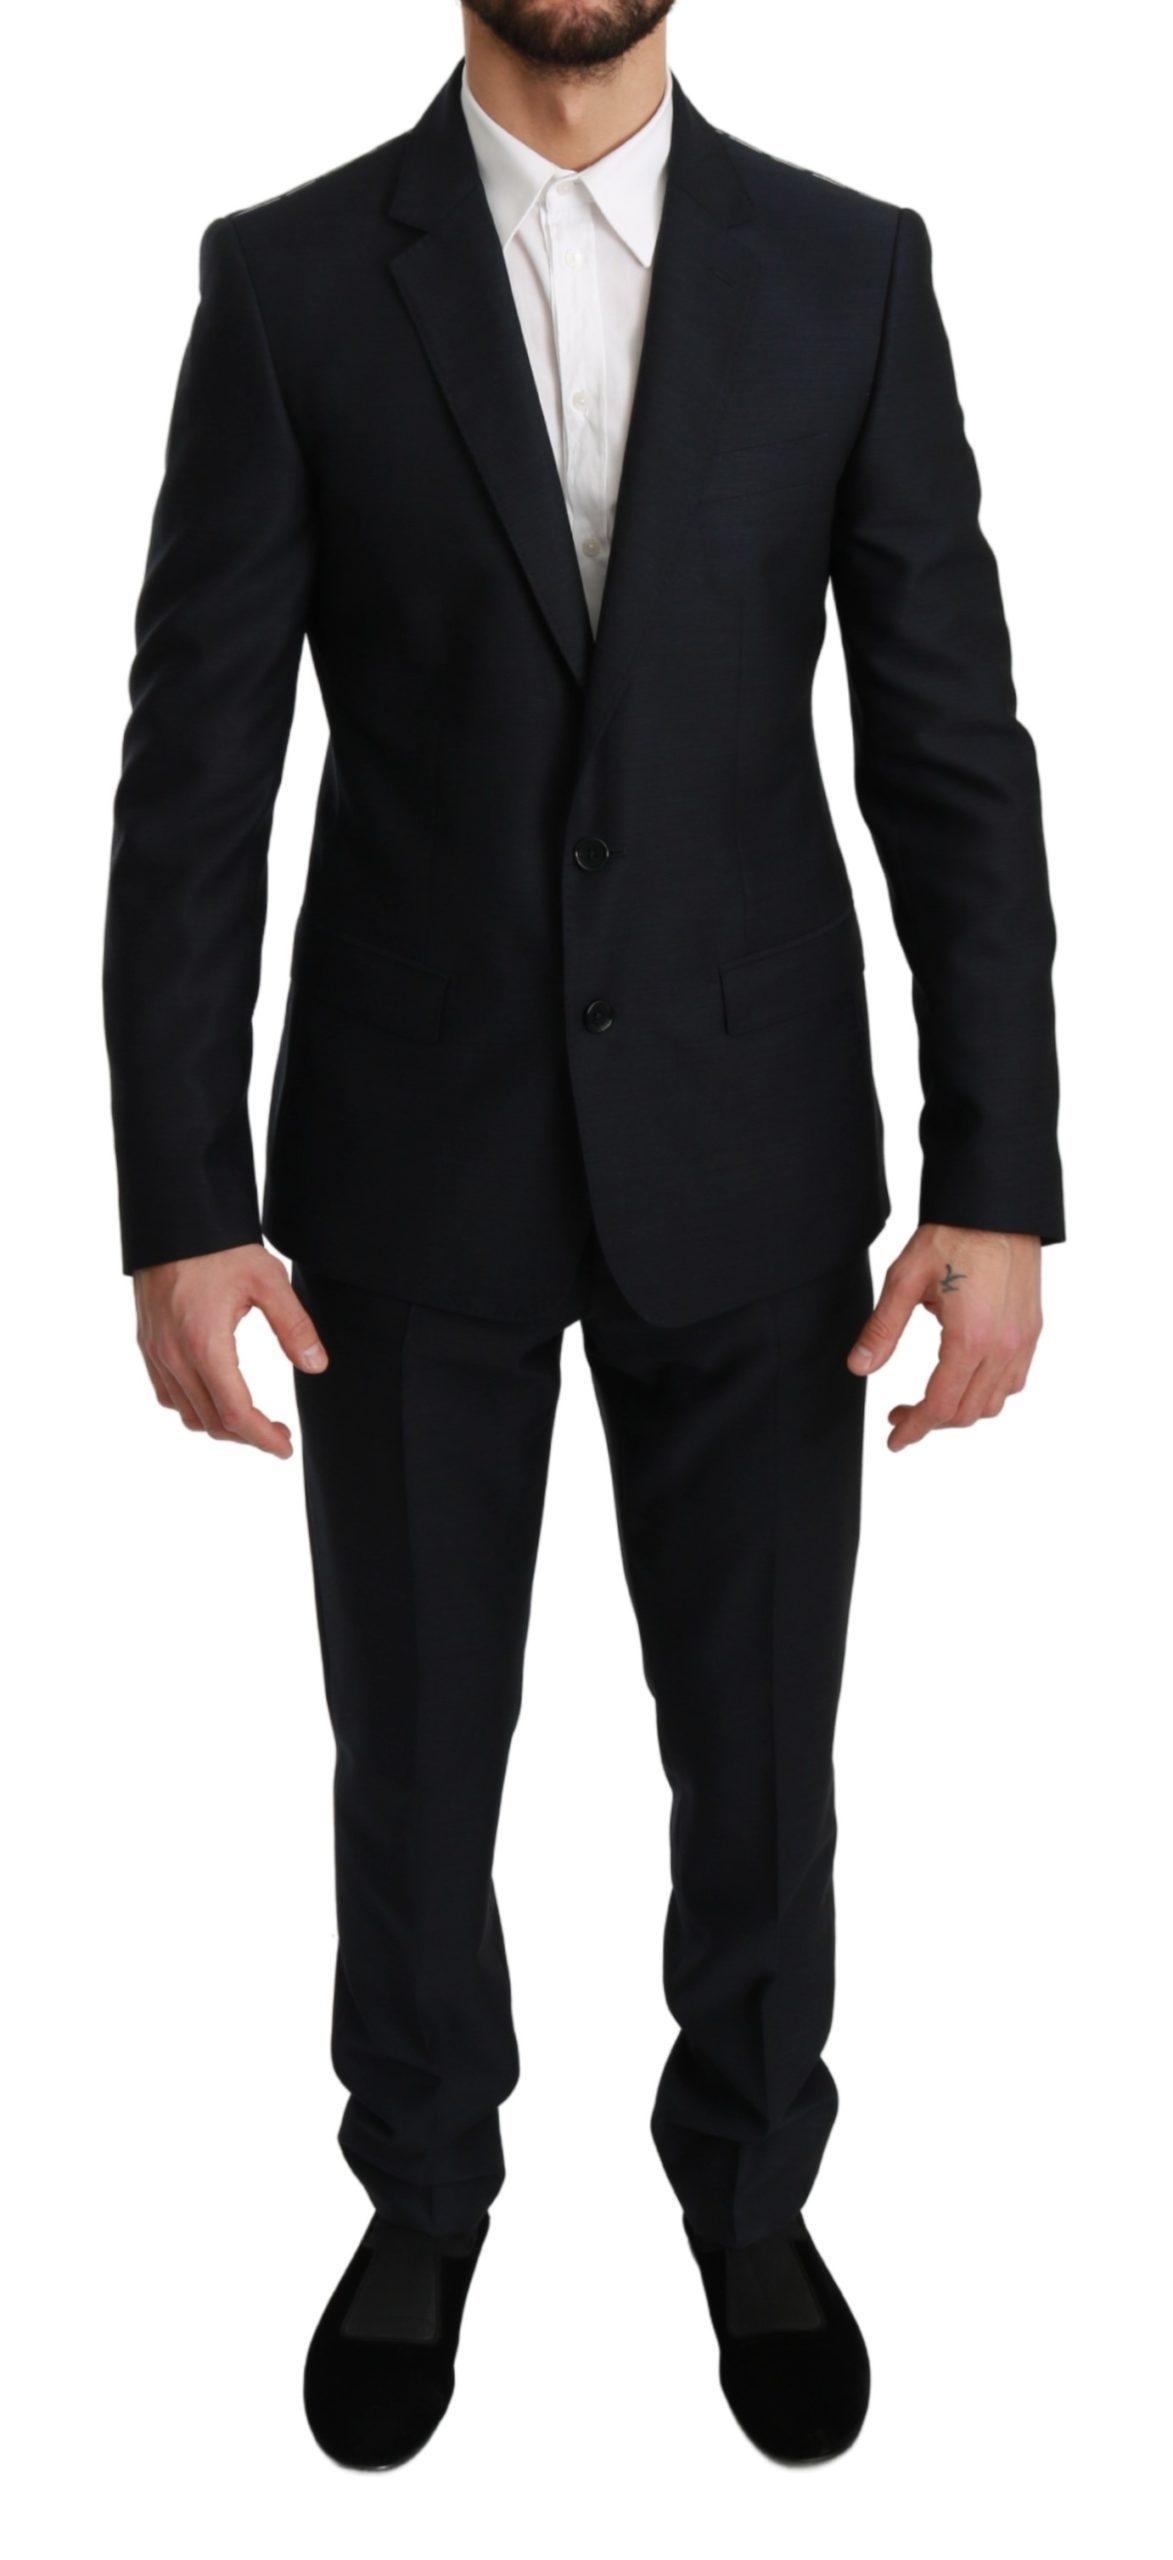 Dolce & Gabbana Men's Slim Fit 2 Piece MARTINI Wool Suit Blue KOS1768 - IT46 | S